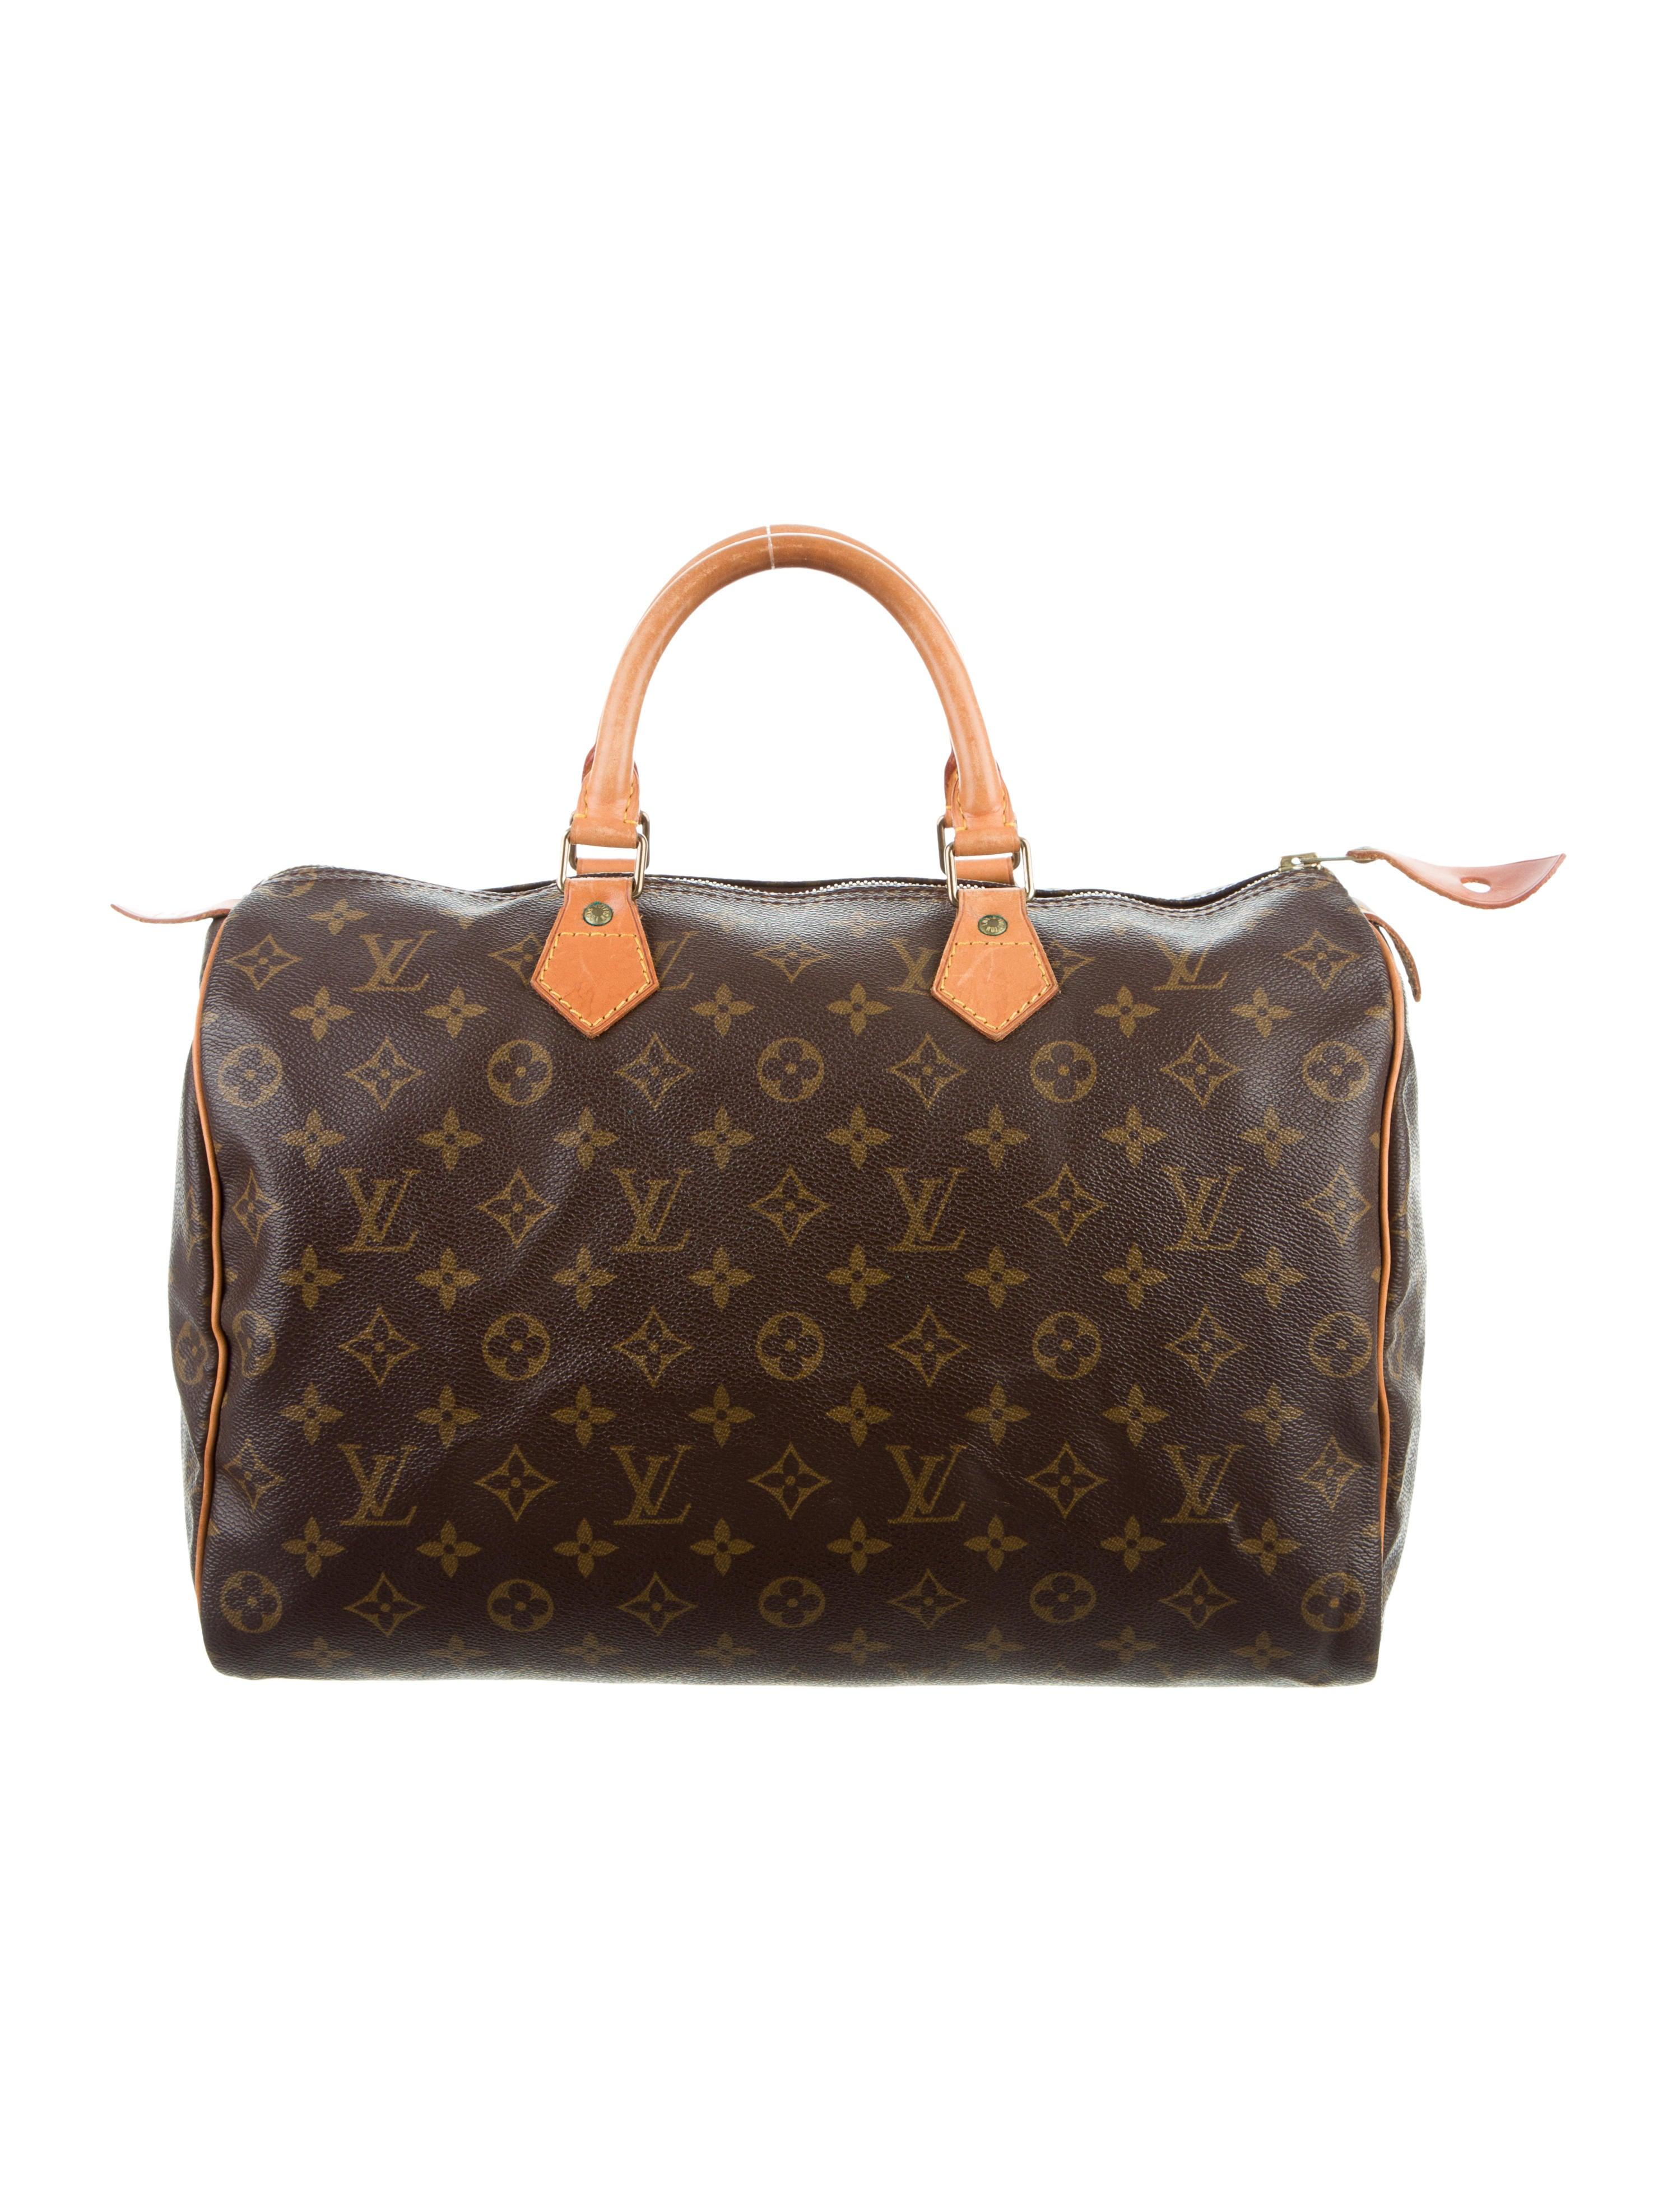 louis vuitton monogram speedy 35 handbags lou120866. Black Bedroom Furniture Sets. Home Design Ideas